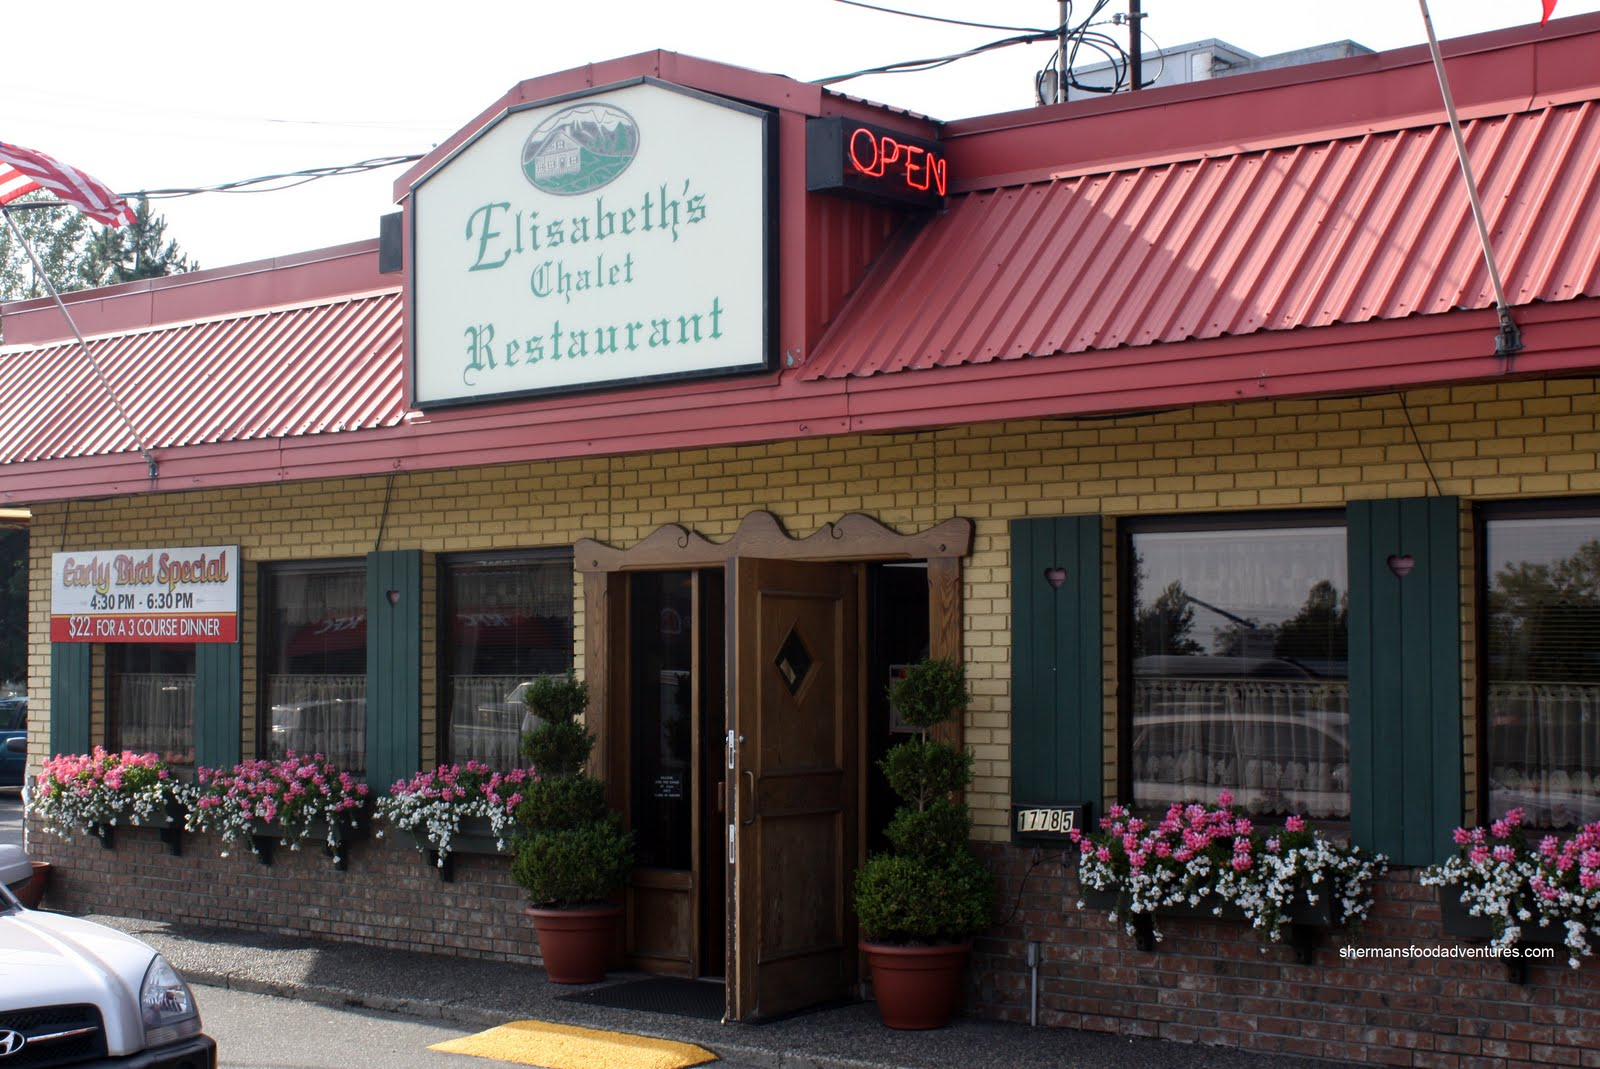 Sherman 39 s food adventures elizabeth 39 s chalet - Chalet cuisine ...